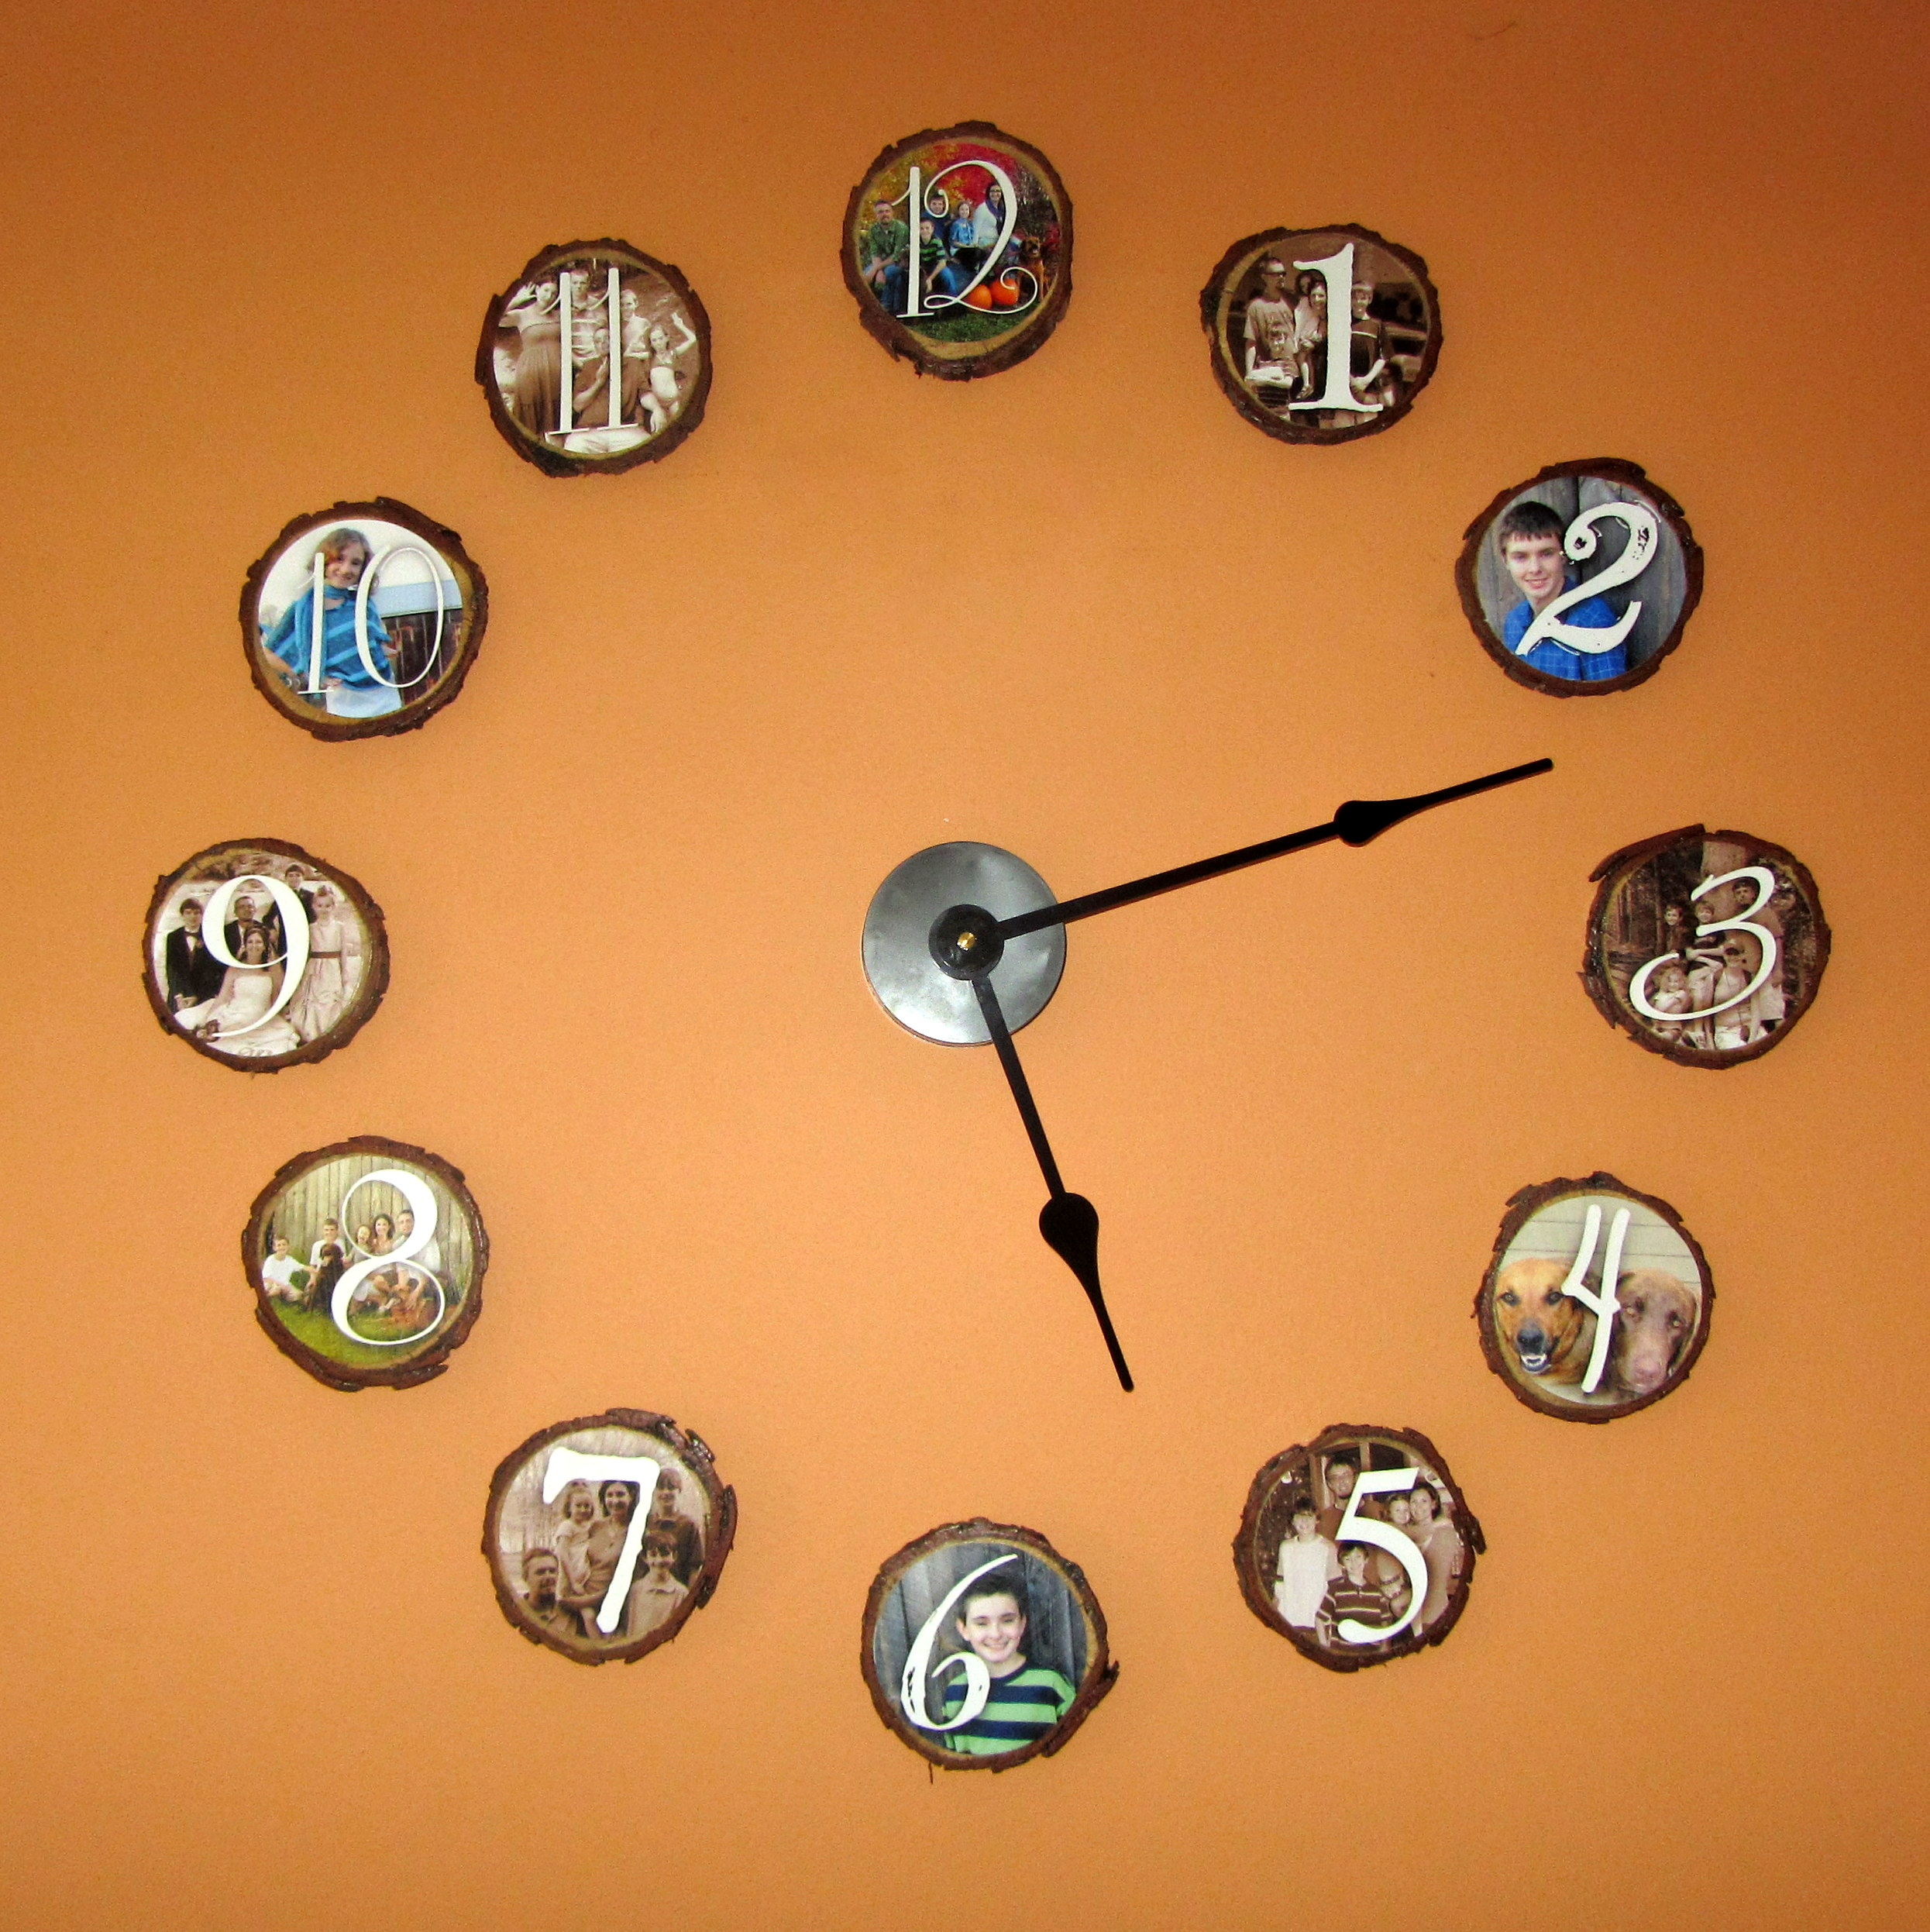 wall clock 3.JPG